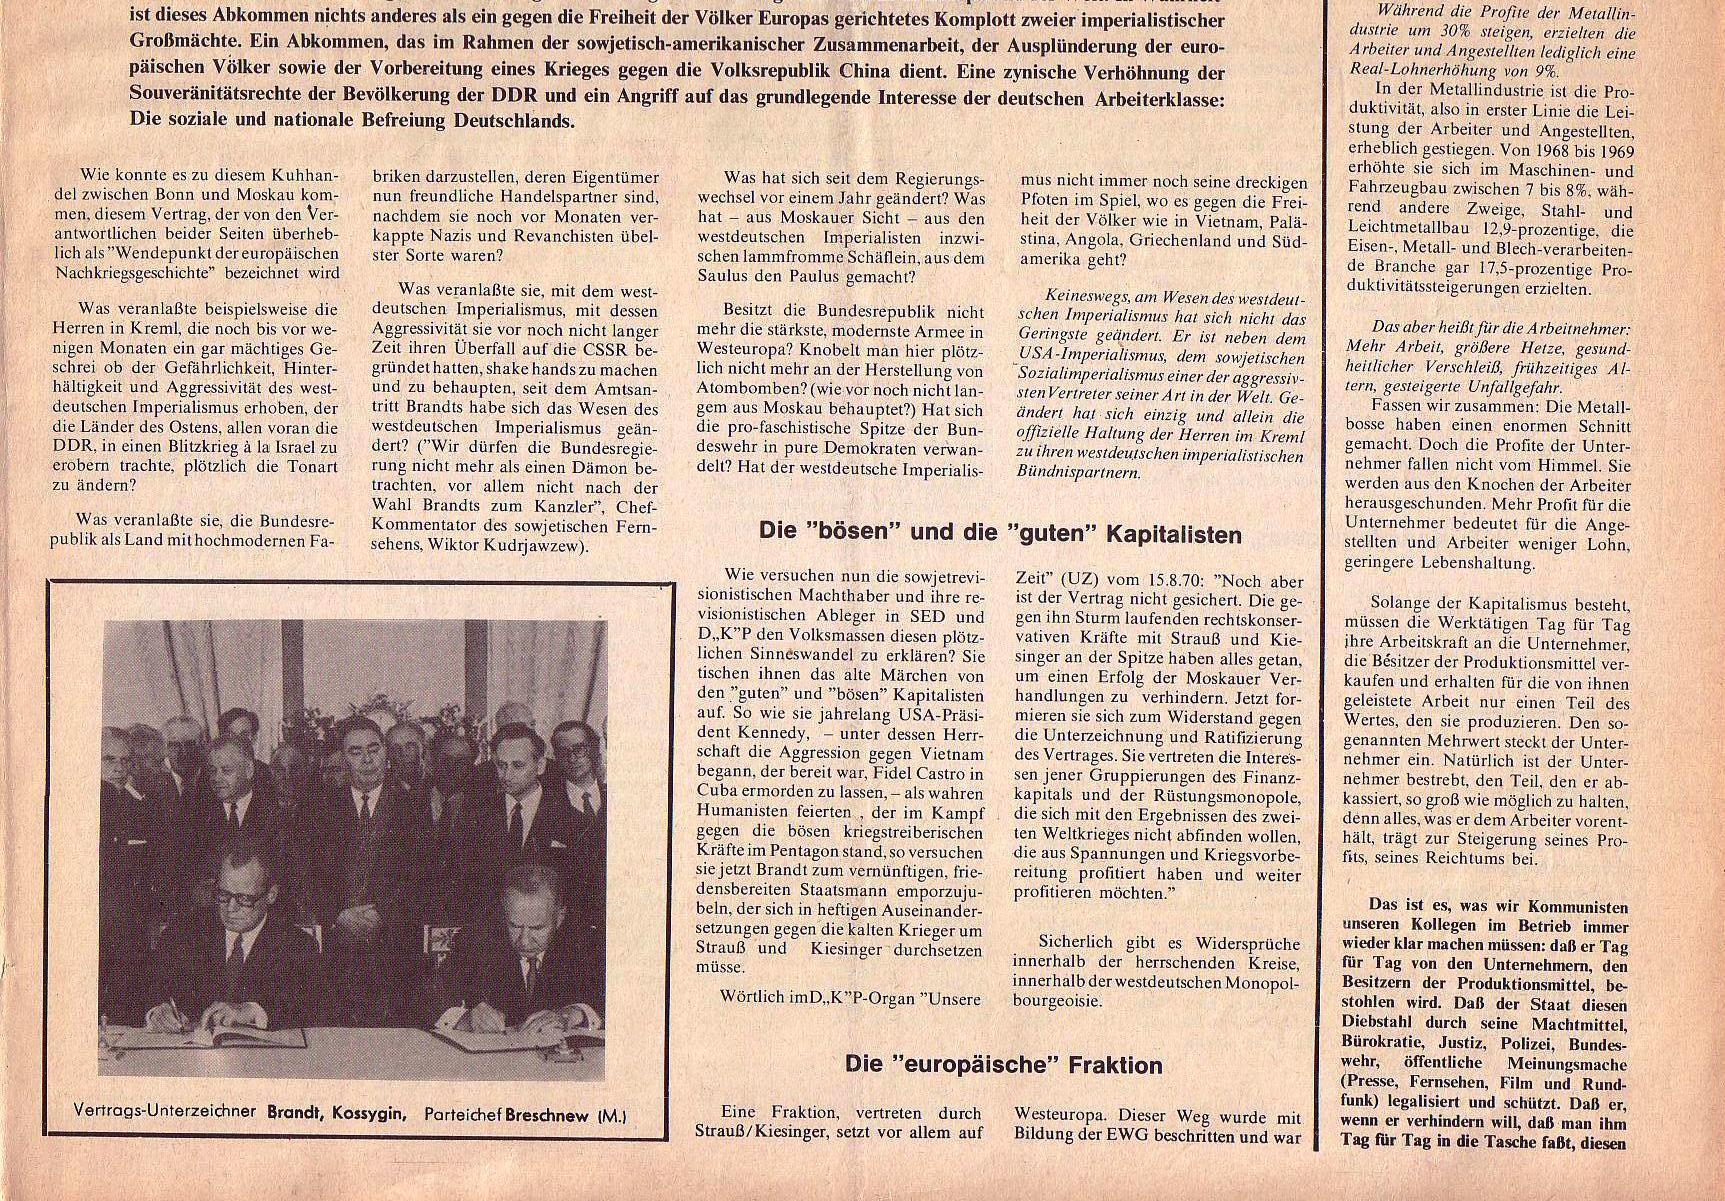 Roter Morgen, 4. Jg., September 1970, Nr. 8, Seite 1b